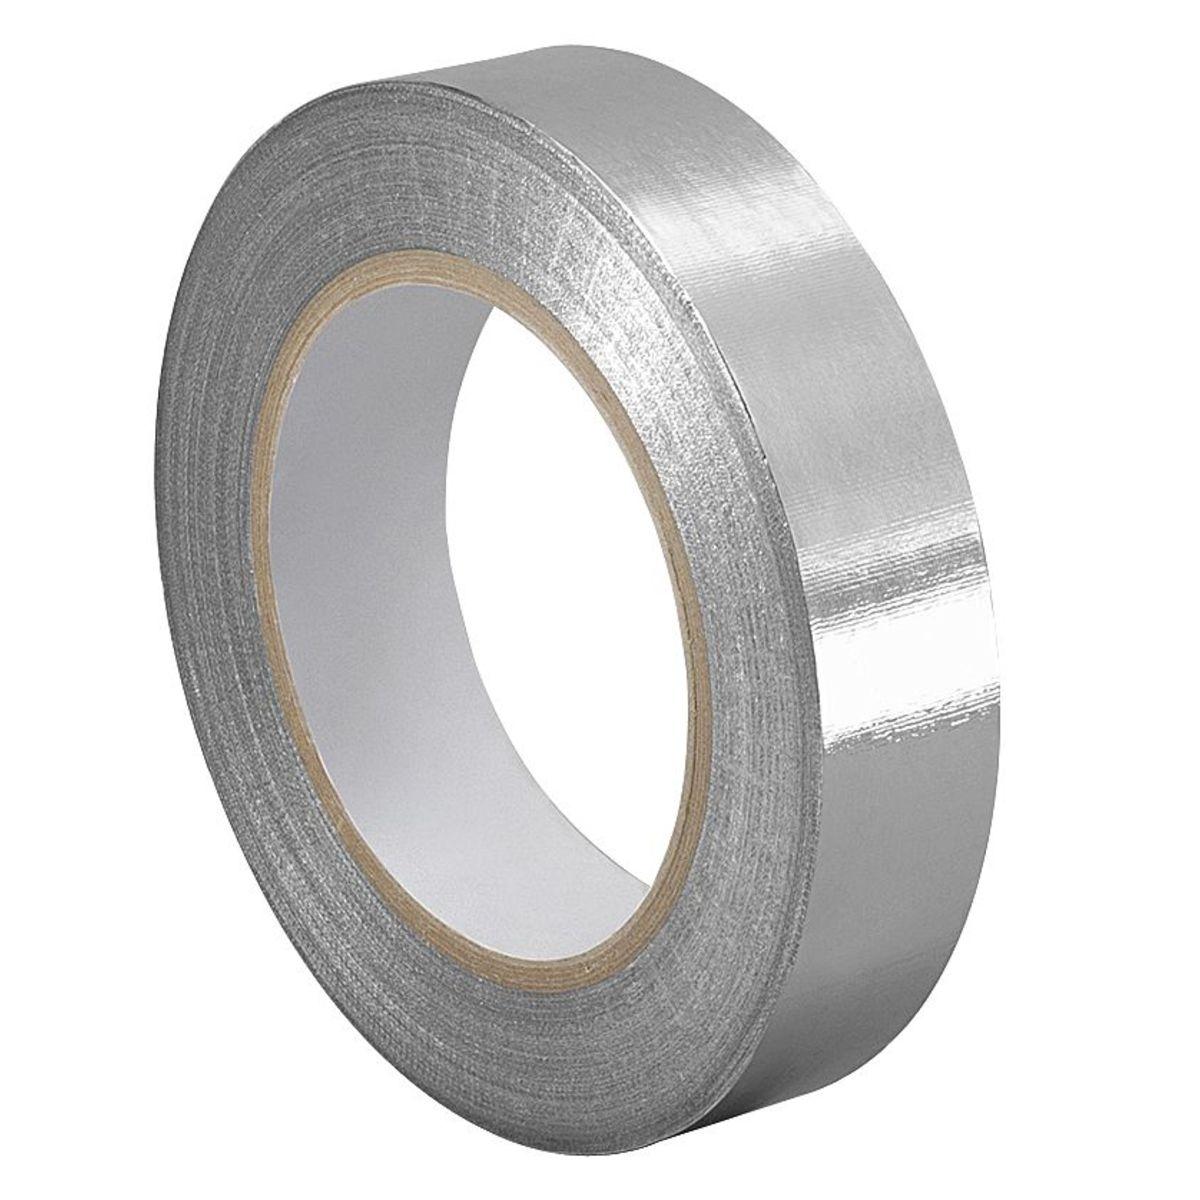 Laboratory Heating Tape Silicone Rubber Gamut 120v Heat Wiring Further Briskheat